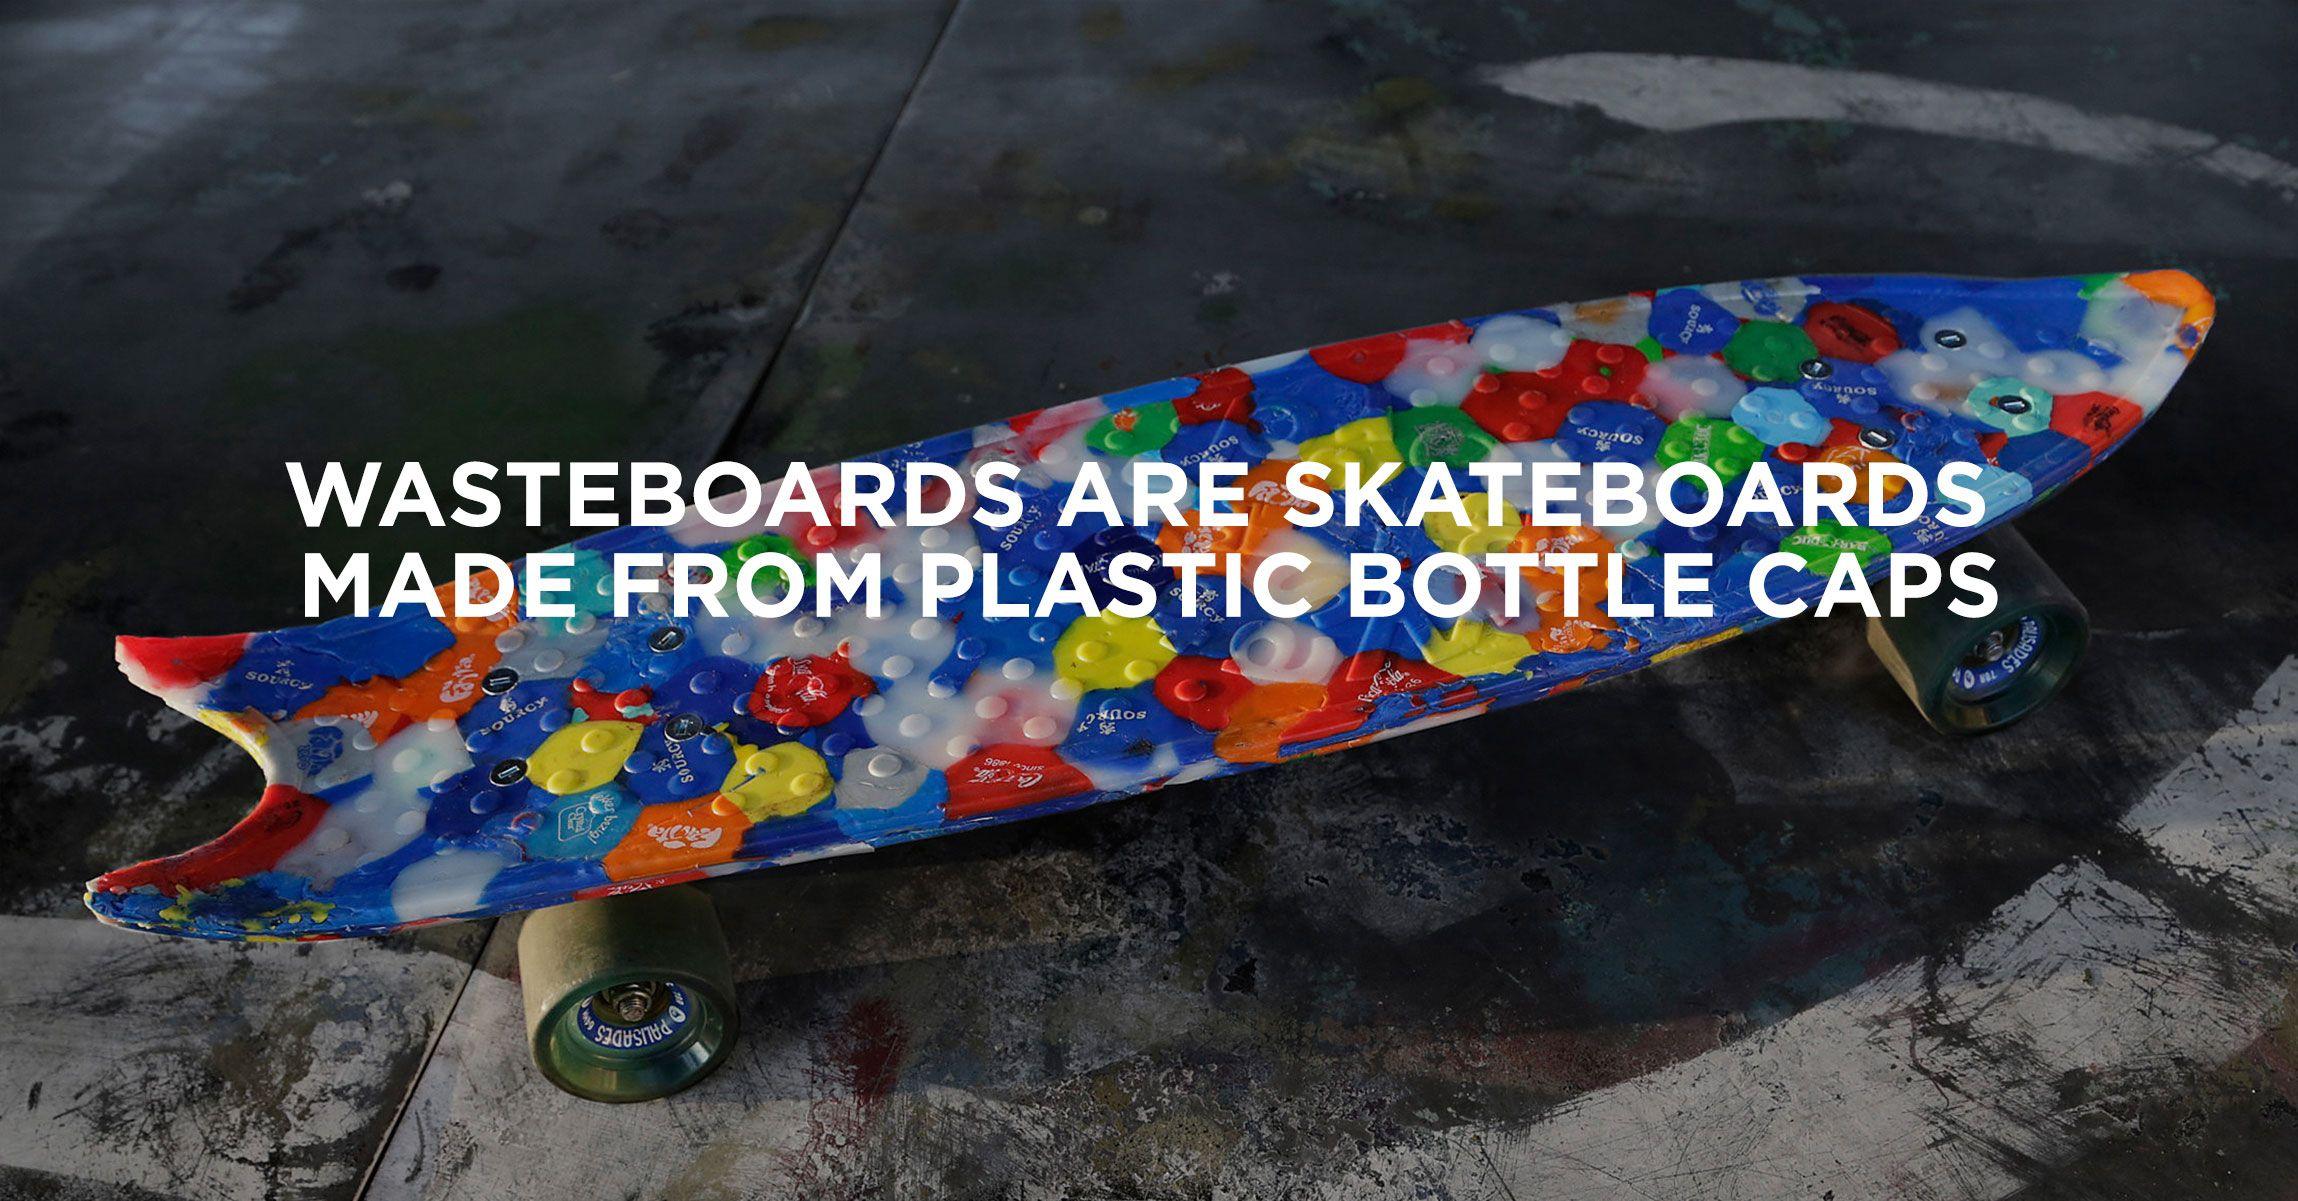 Wasteboards Skateboards From Waste Plastic Bottle Caps Plastic Skateboard Plastic Bottles